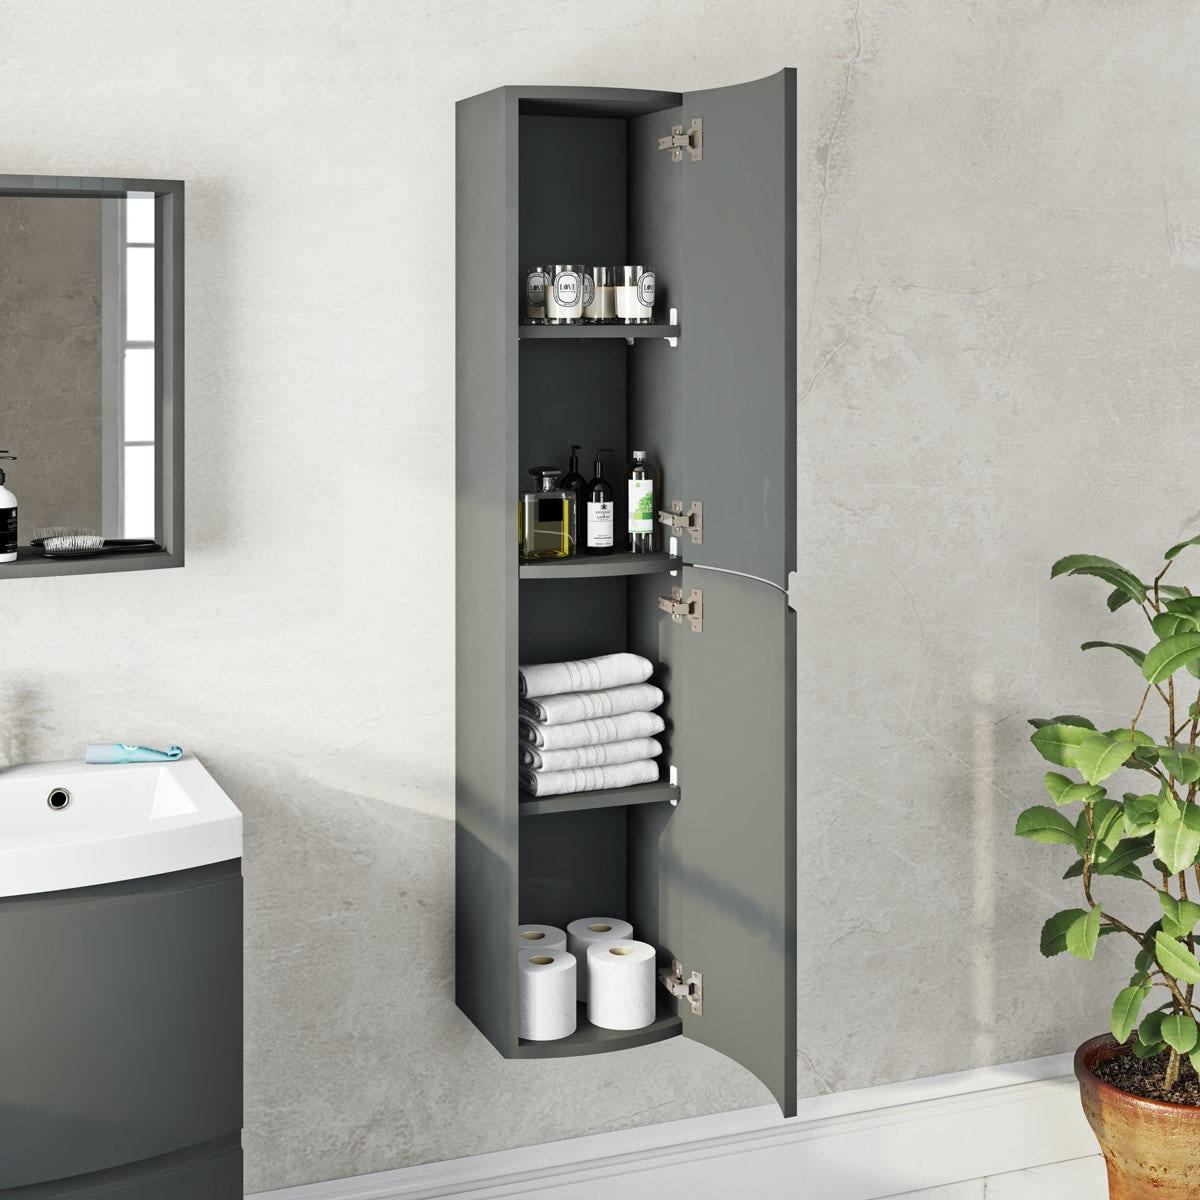 Mode Harrison slate wall hung storage cabinet   VictoriaPlum.com